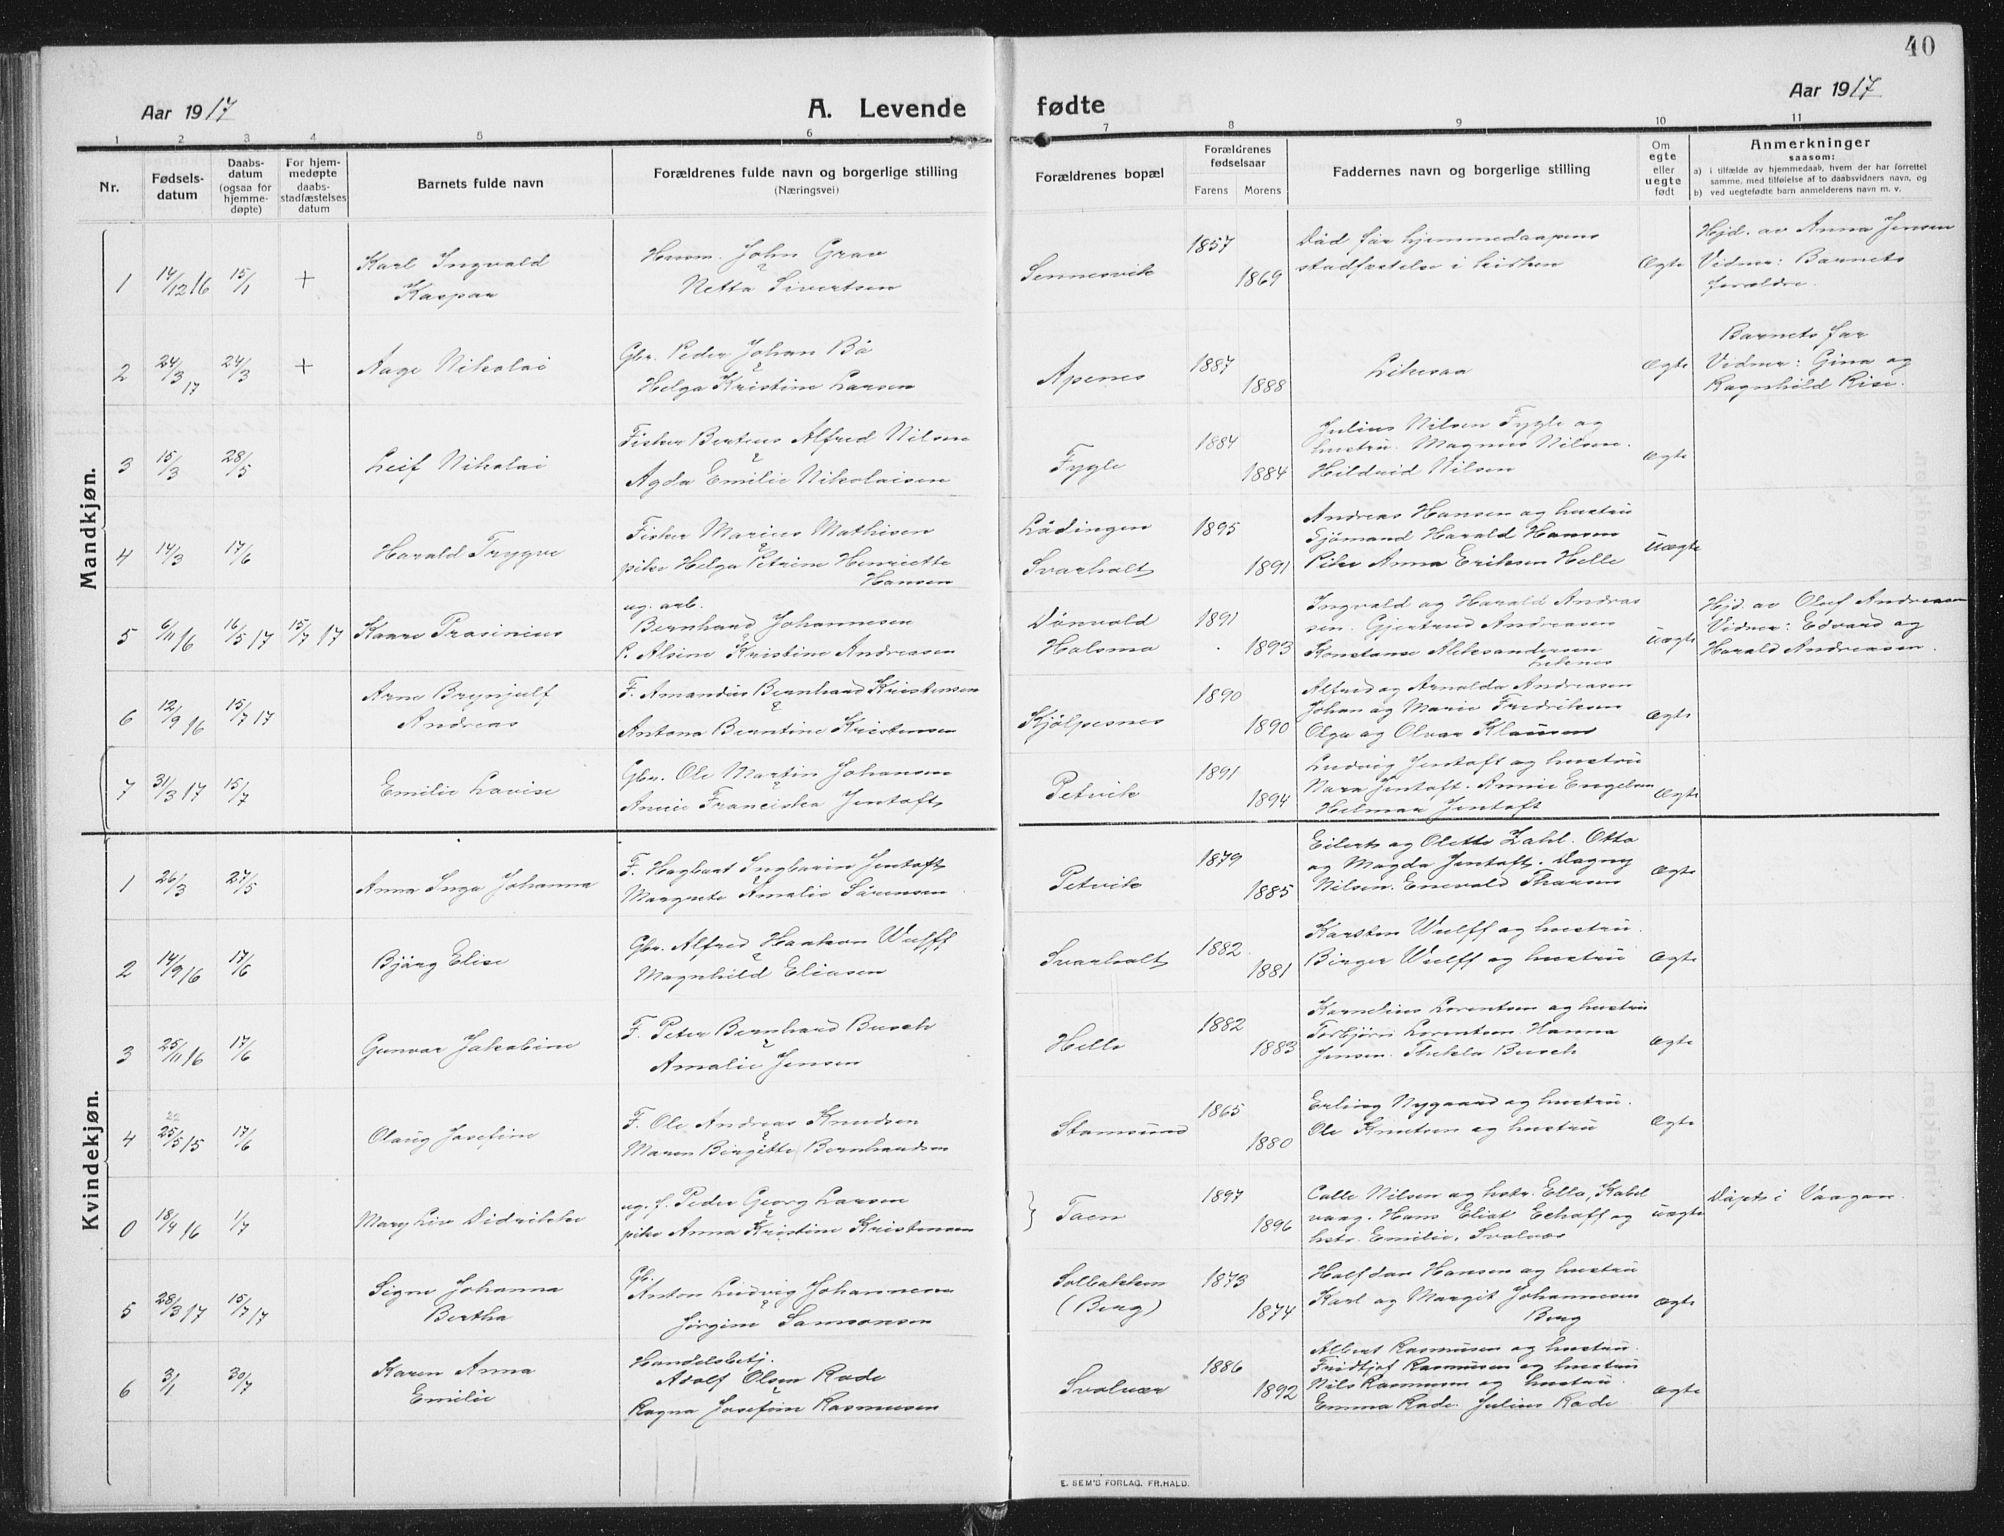 SAT, Ministerialprotokoller, klokkerbøker og fødselsregistre - Nordland, 882/L1183: Klokkerbok nr. 882C01, 1911-1938, s. 40